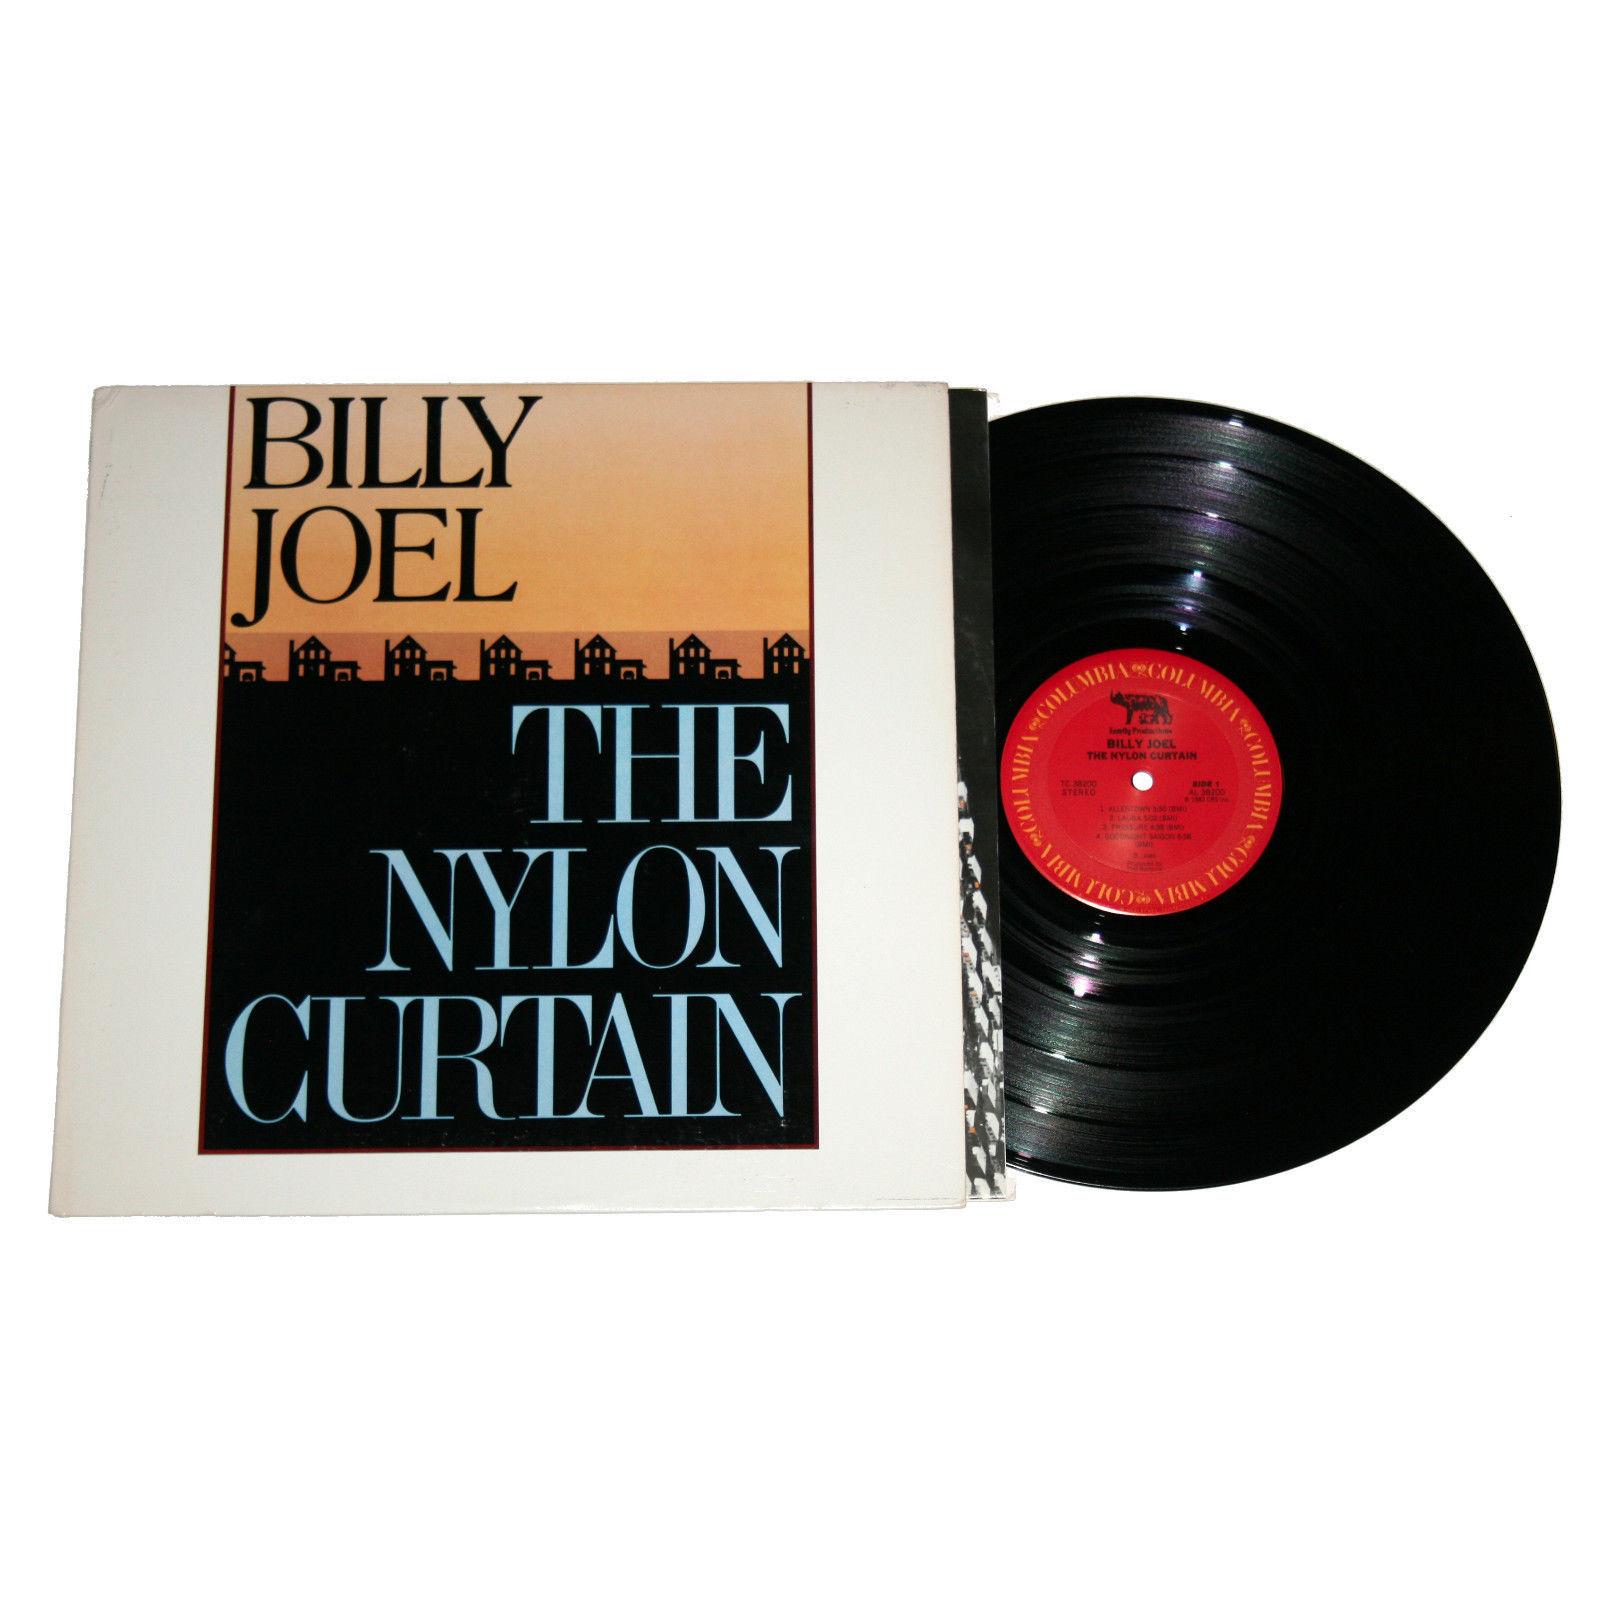 Billy Joel - The Nylon Curtain Album